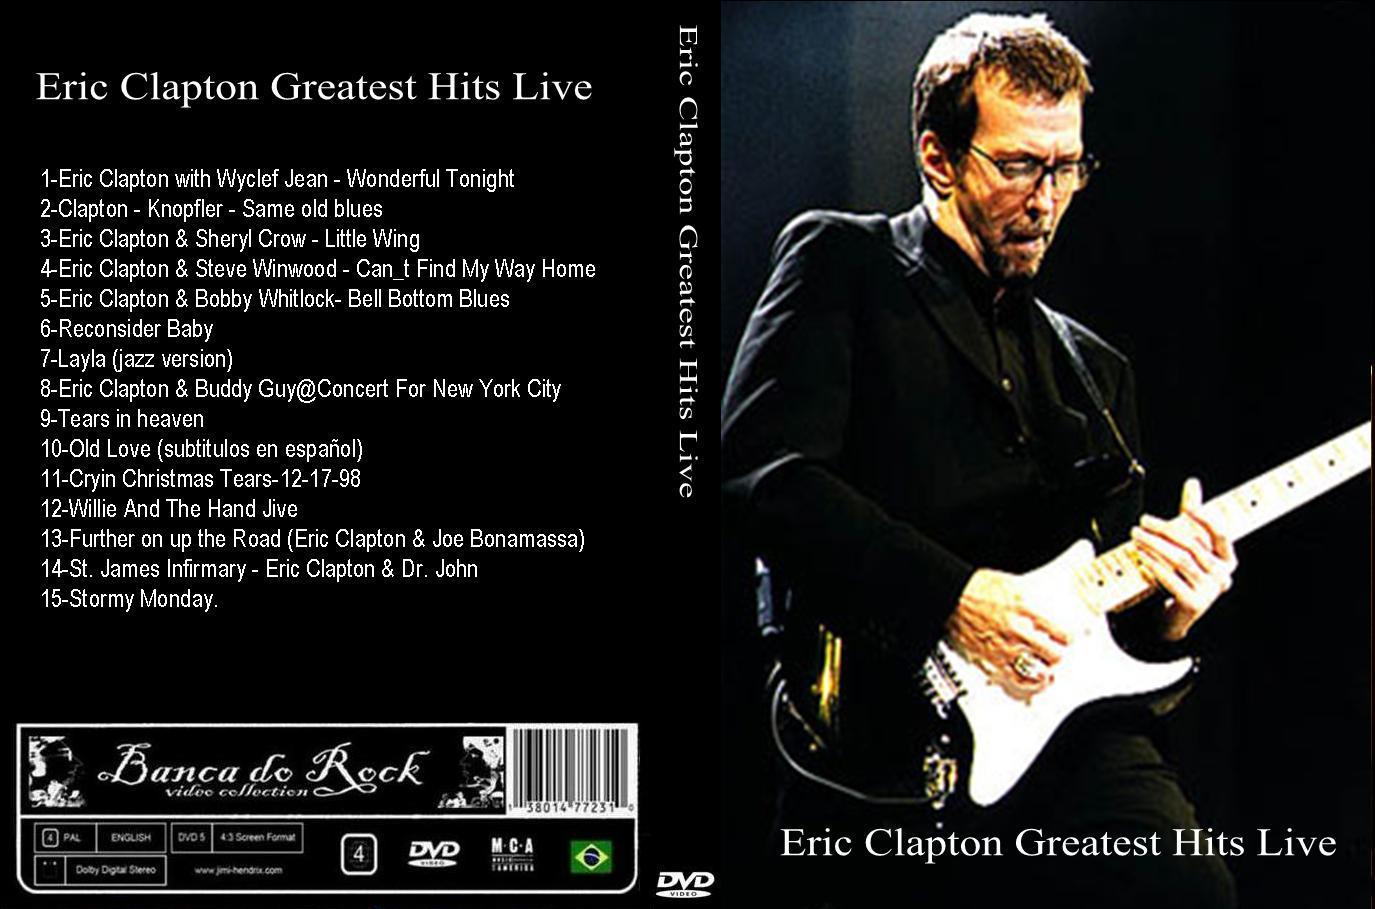 banca do rock rock concert dvd 1060 dvd eric clapton bootleg. Black Bedroom Furniture Sets. Home Design Ideas